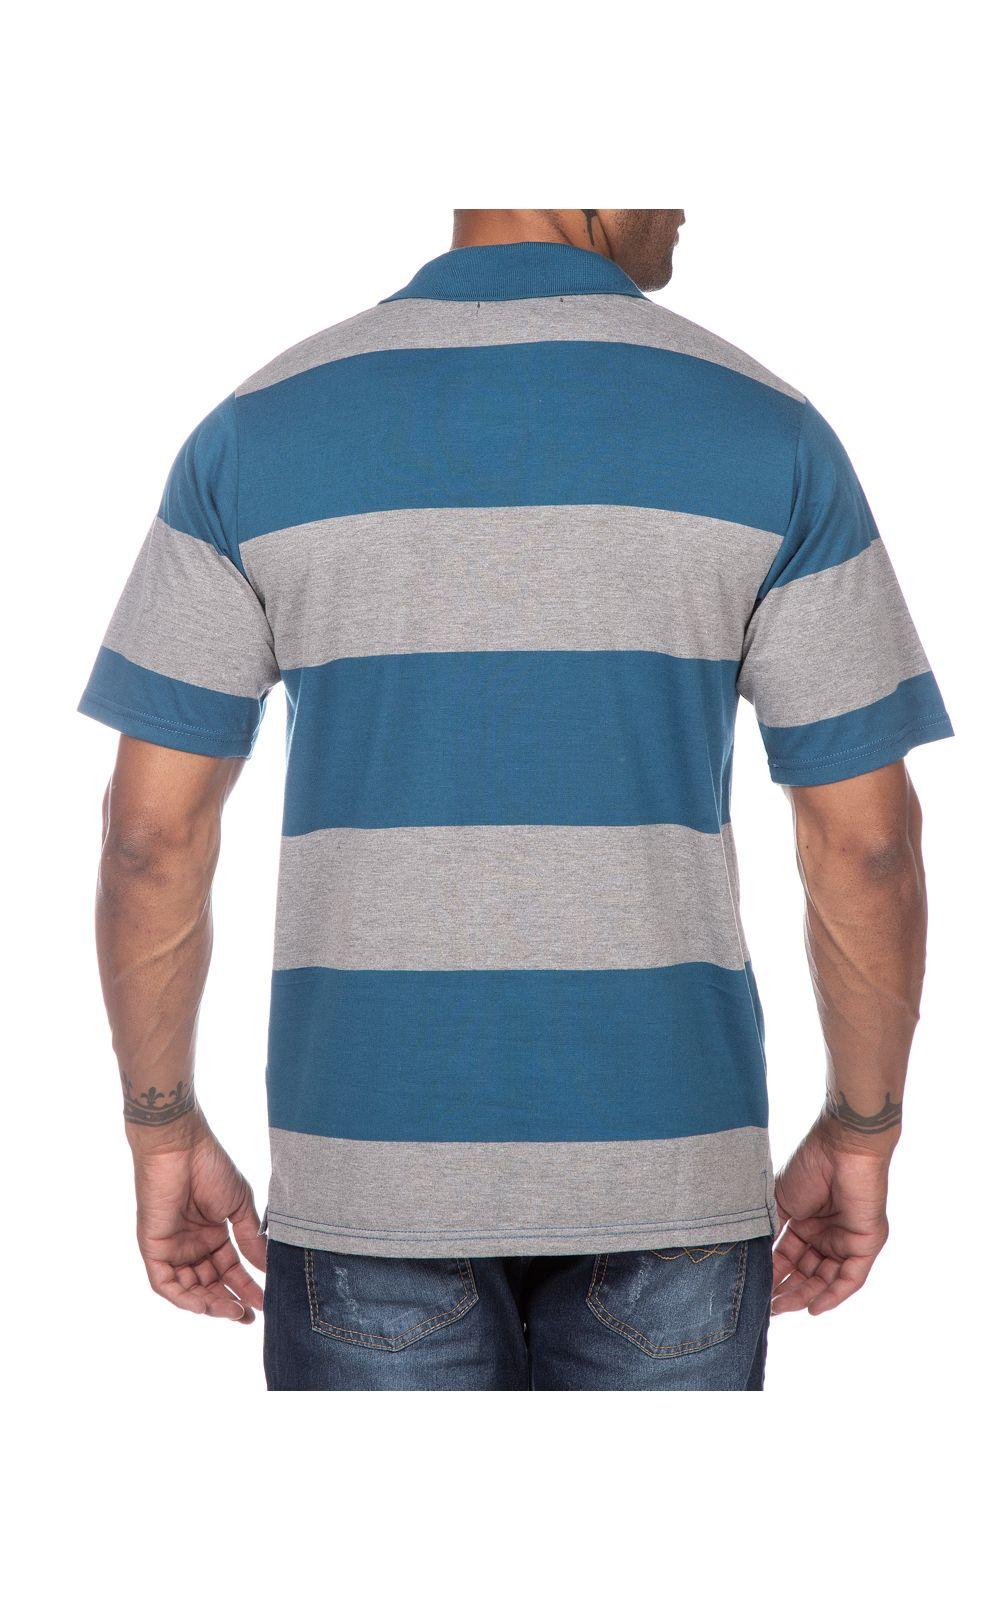 Foto 2 - Camisa Polo Masculina Azul Listrada